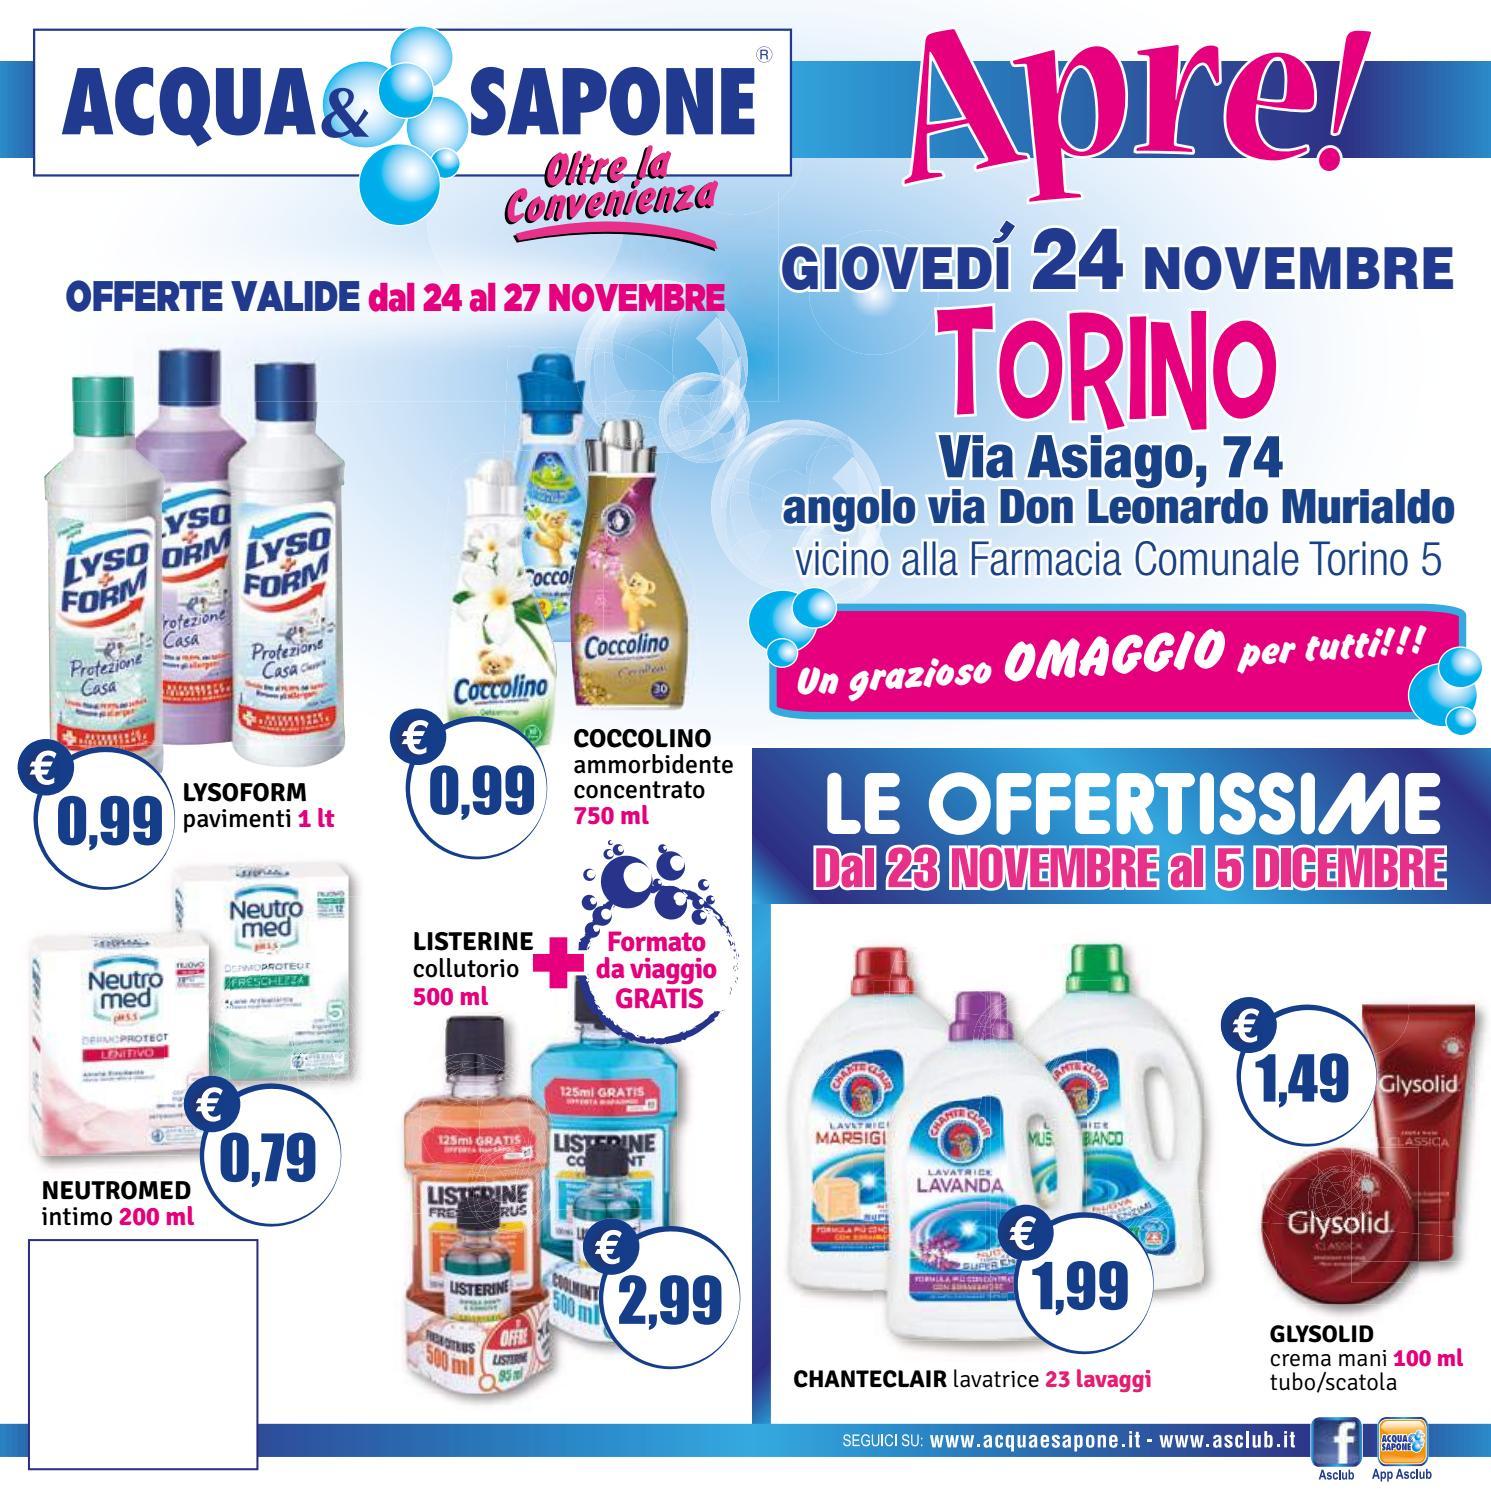 Volantino acqua sapone apertura torino by acqua sapone for Asclub volantino